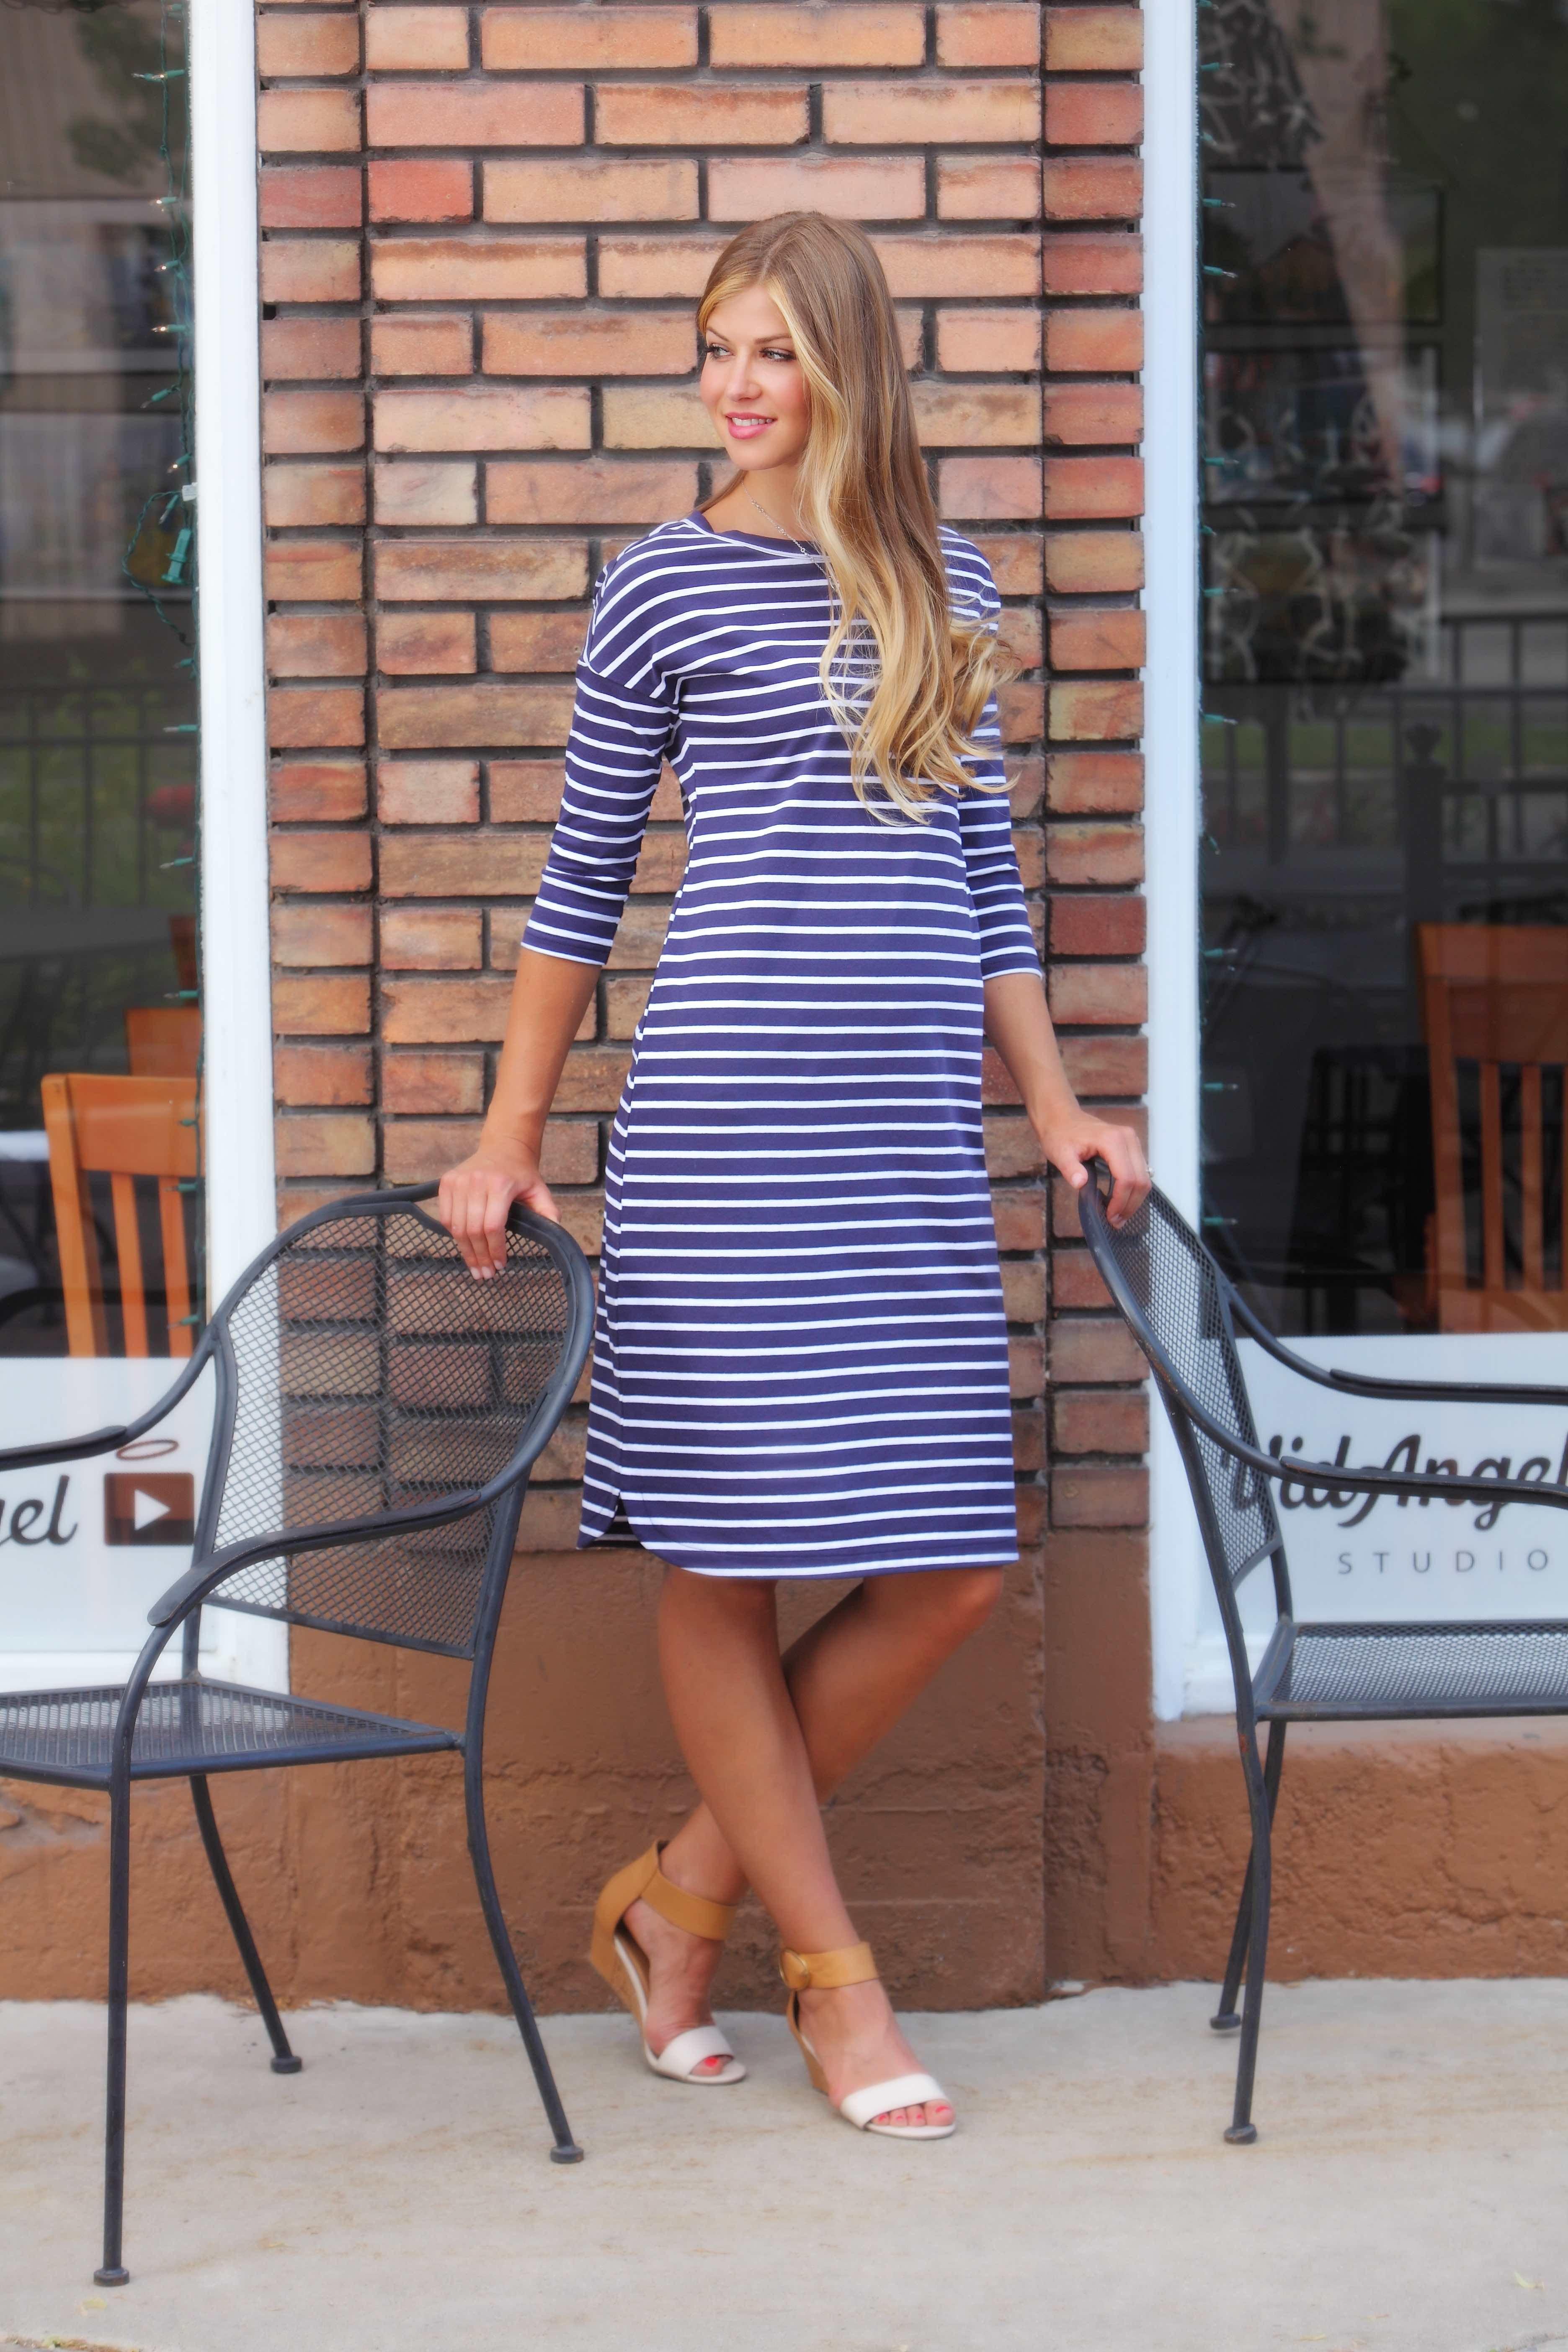 Modest Summer Dresses Modest Summer Dresses Modest Dresses Casual Summer Dresses [ 5616 x 3744 Pixel ]